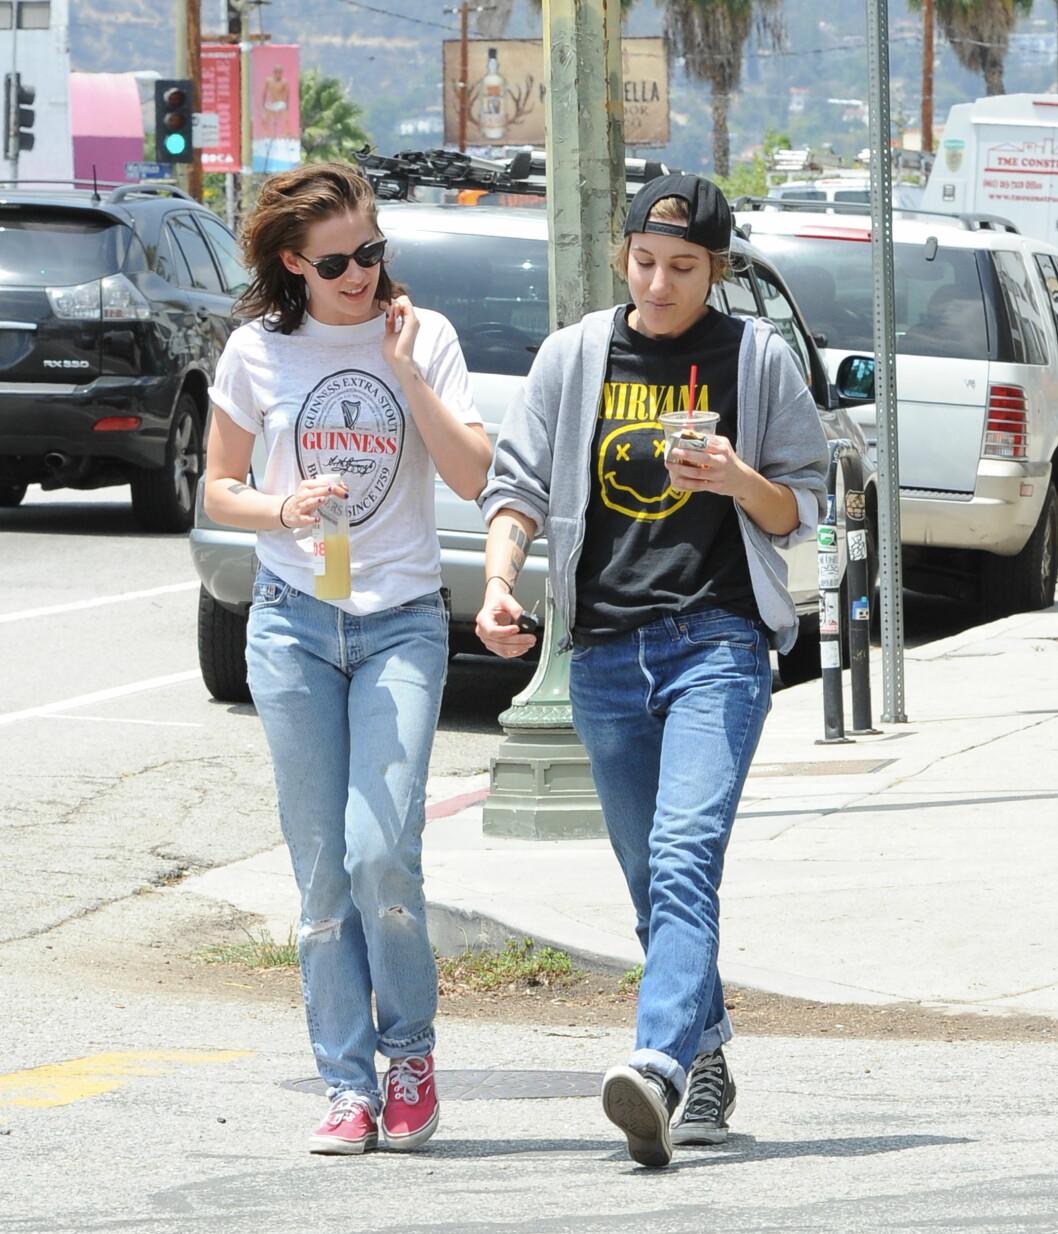 NY FLAMME: Ingen av dem har bekreftet forholdet enda, men amerikanske medier har i lang tid ment at Kristen er i et forhold med Alicia Cargile. Foto: Scanpix